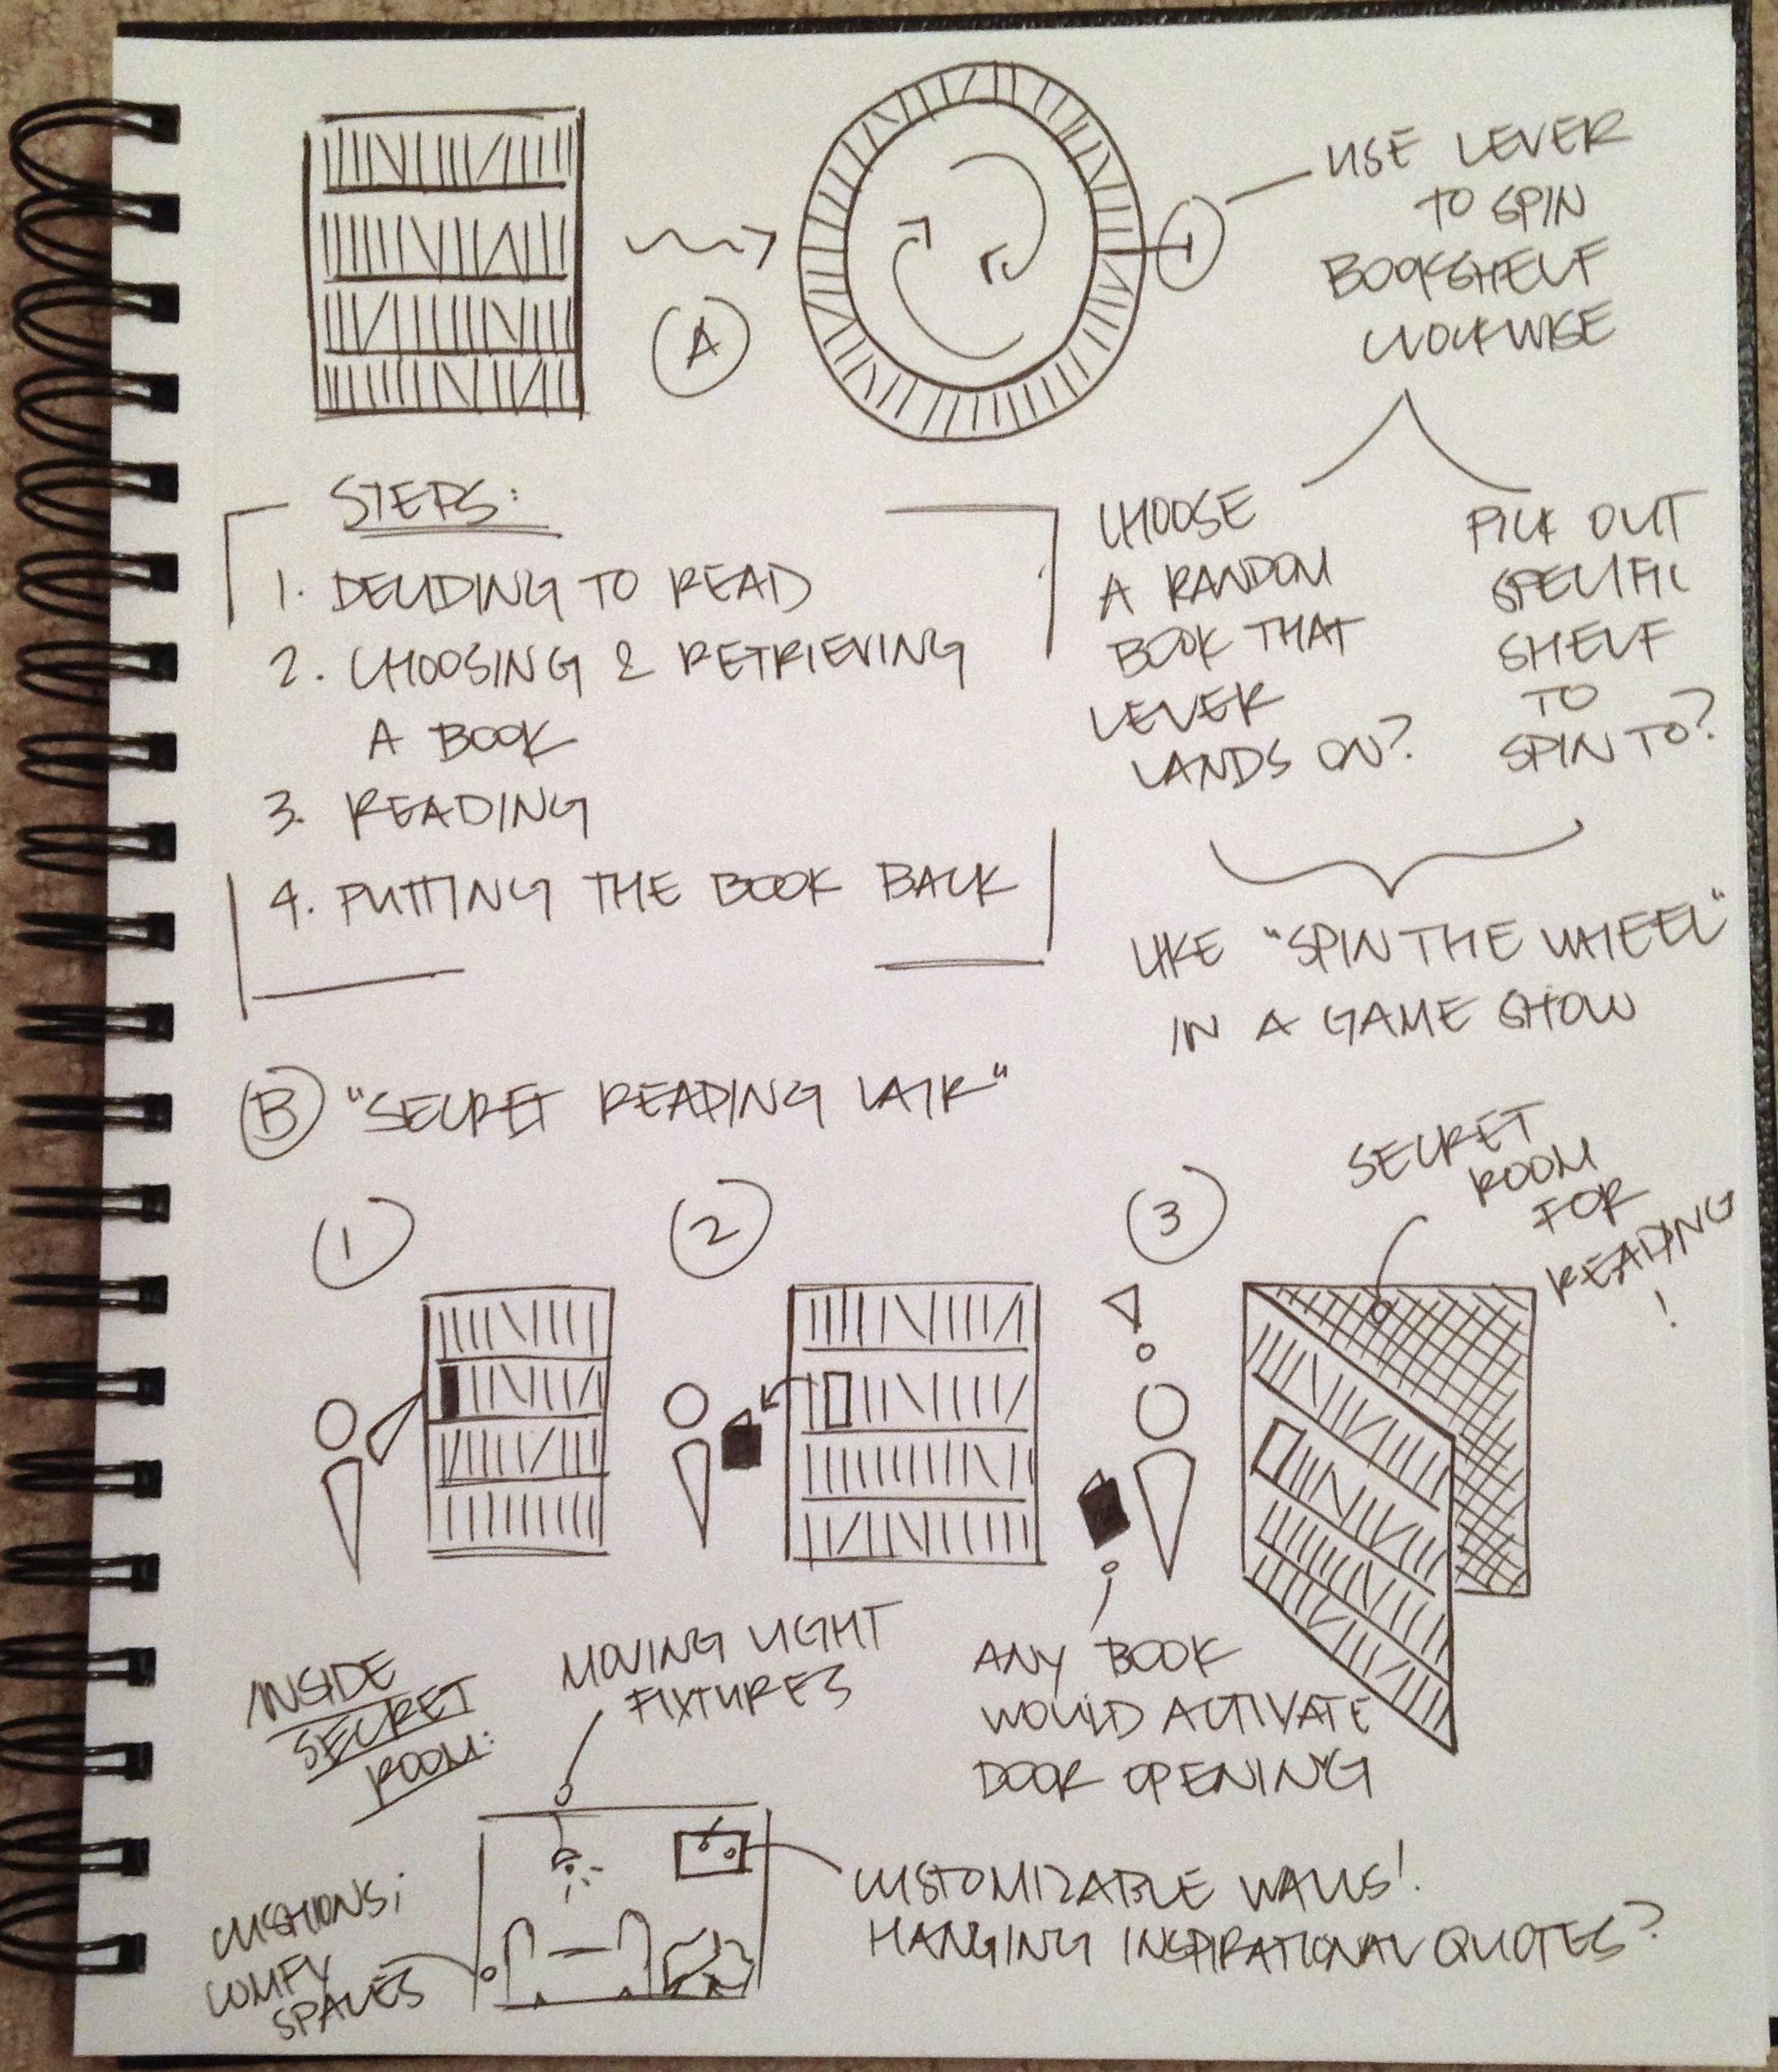 DP3: Final Bookshelf Product Ideation (1/2)